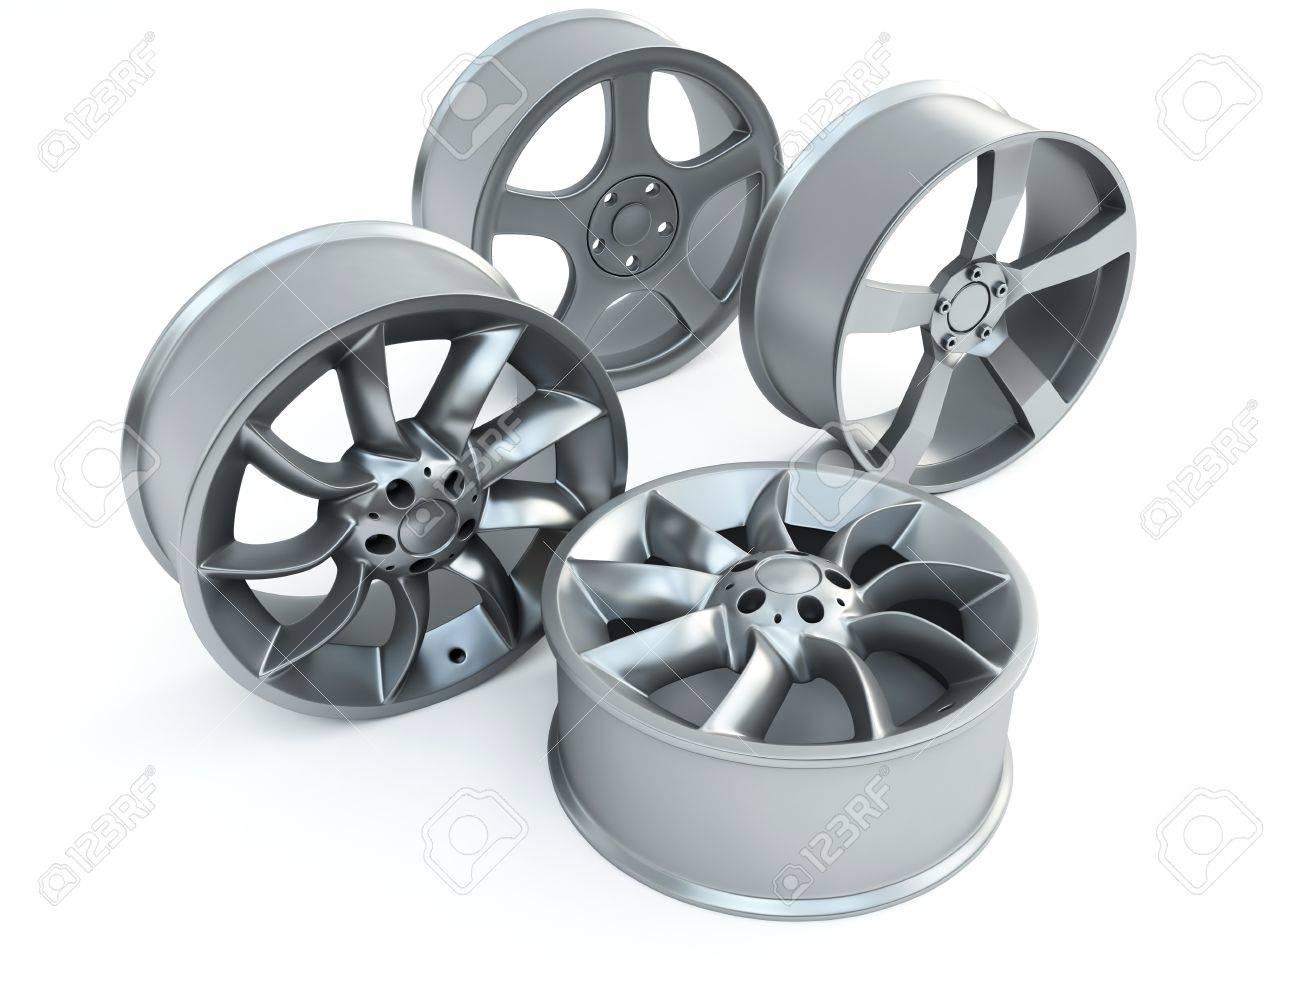 car disk wheels Stock Photo - 9640015